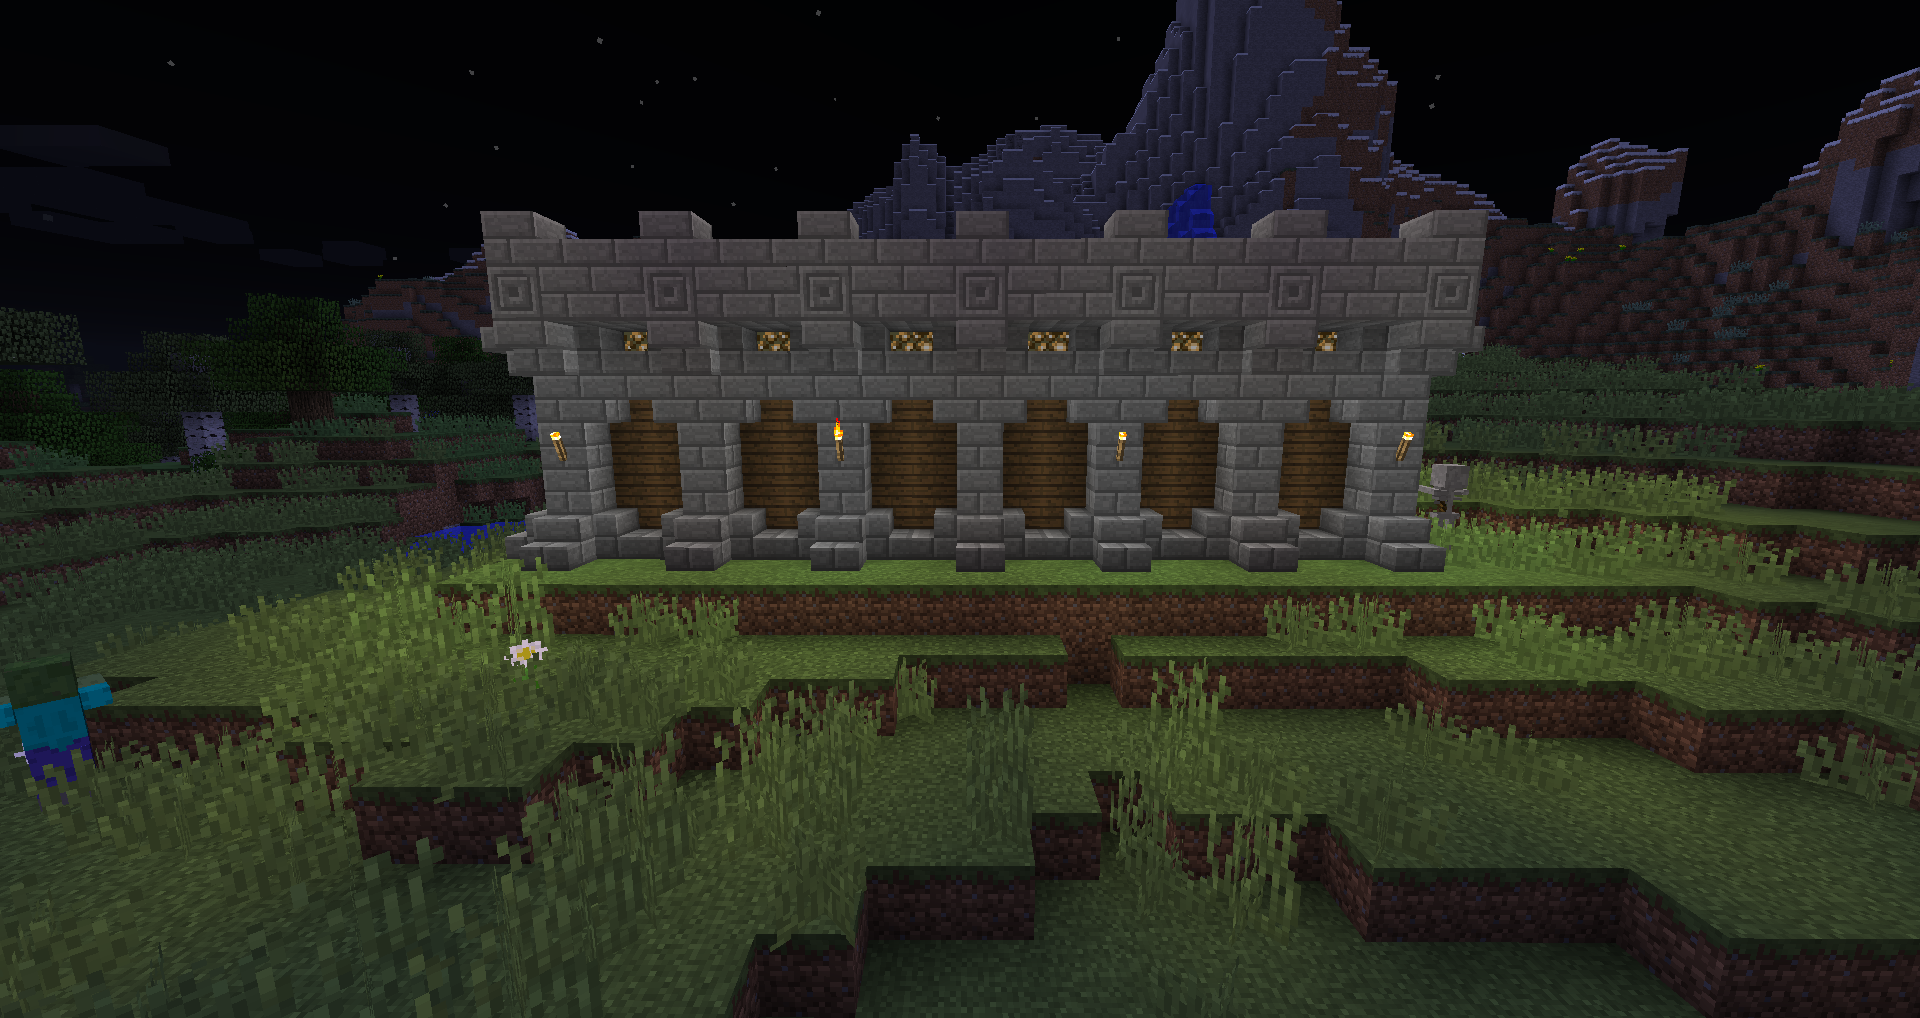 my survival world castle idea thread - survival mode - minecraft